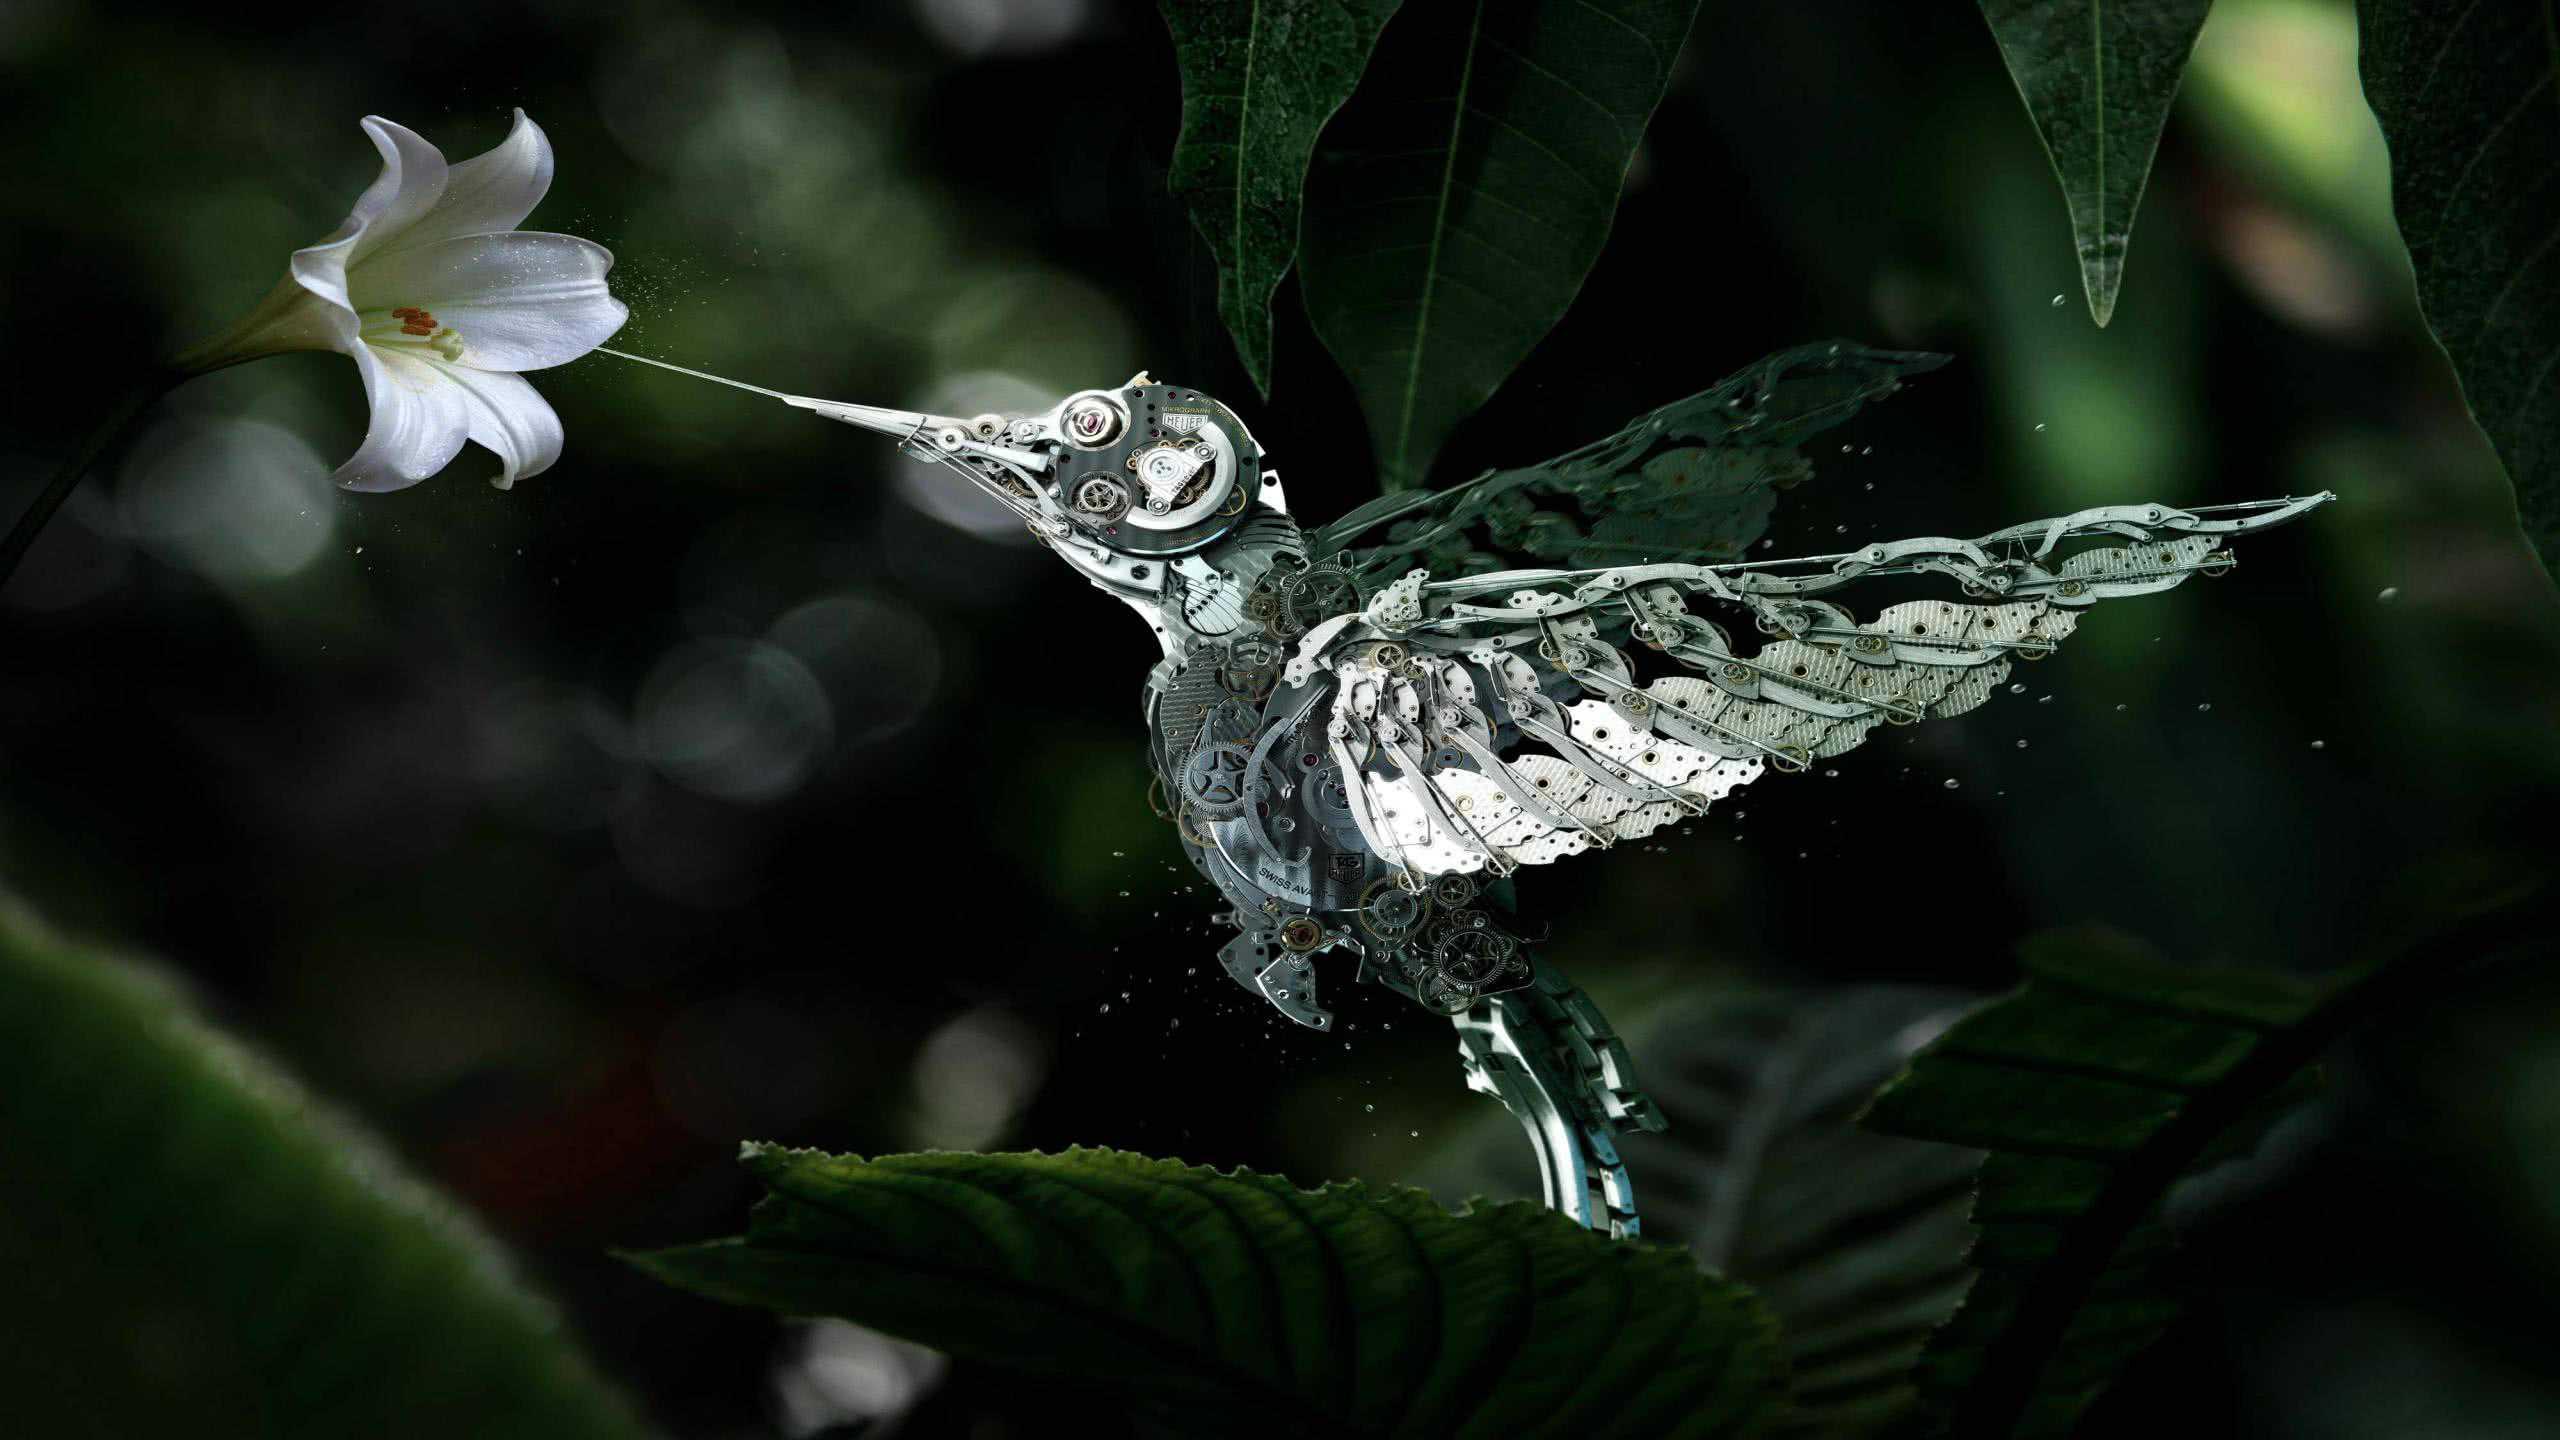 Download Cars Wallpapers For Mobile Mechanical Hummingbird Wqhd 1440p Wallpaper Pixelz